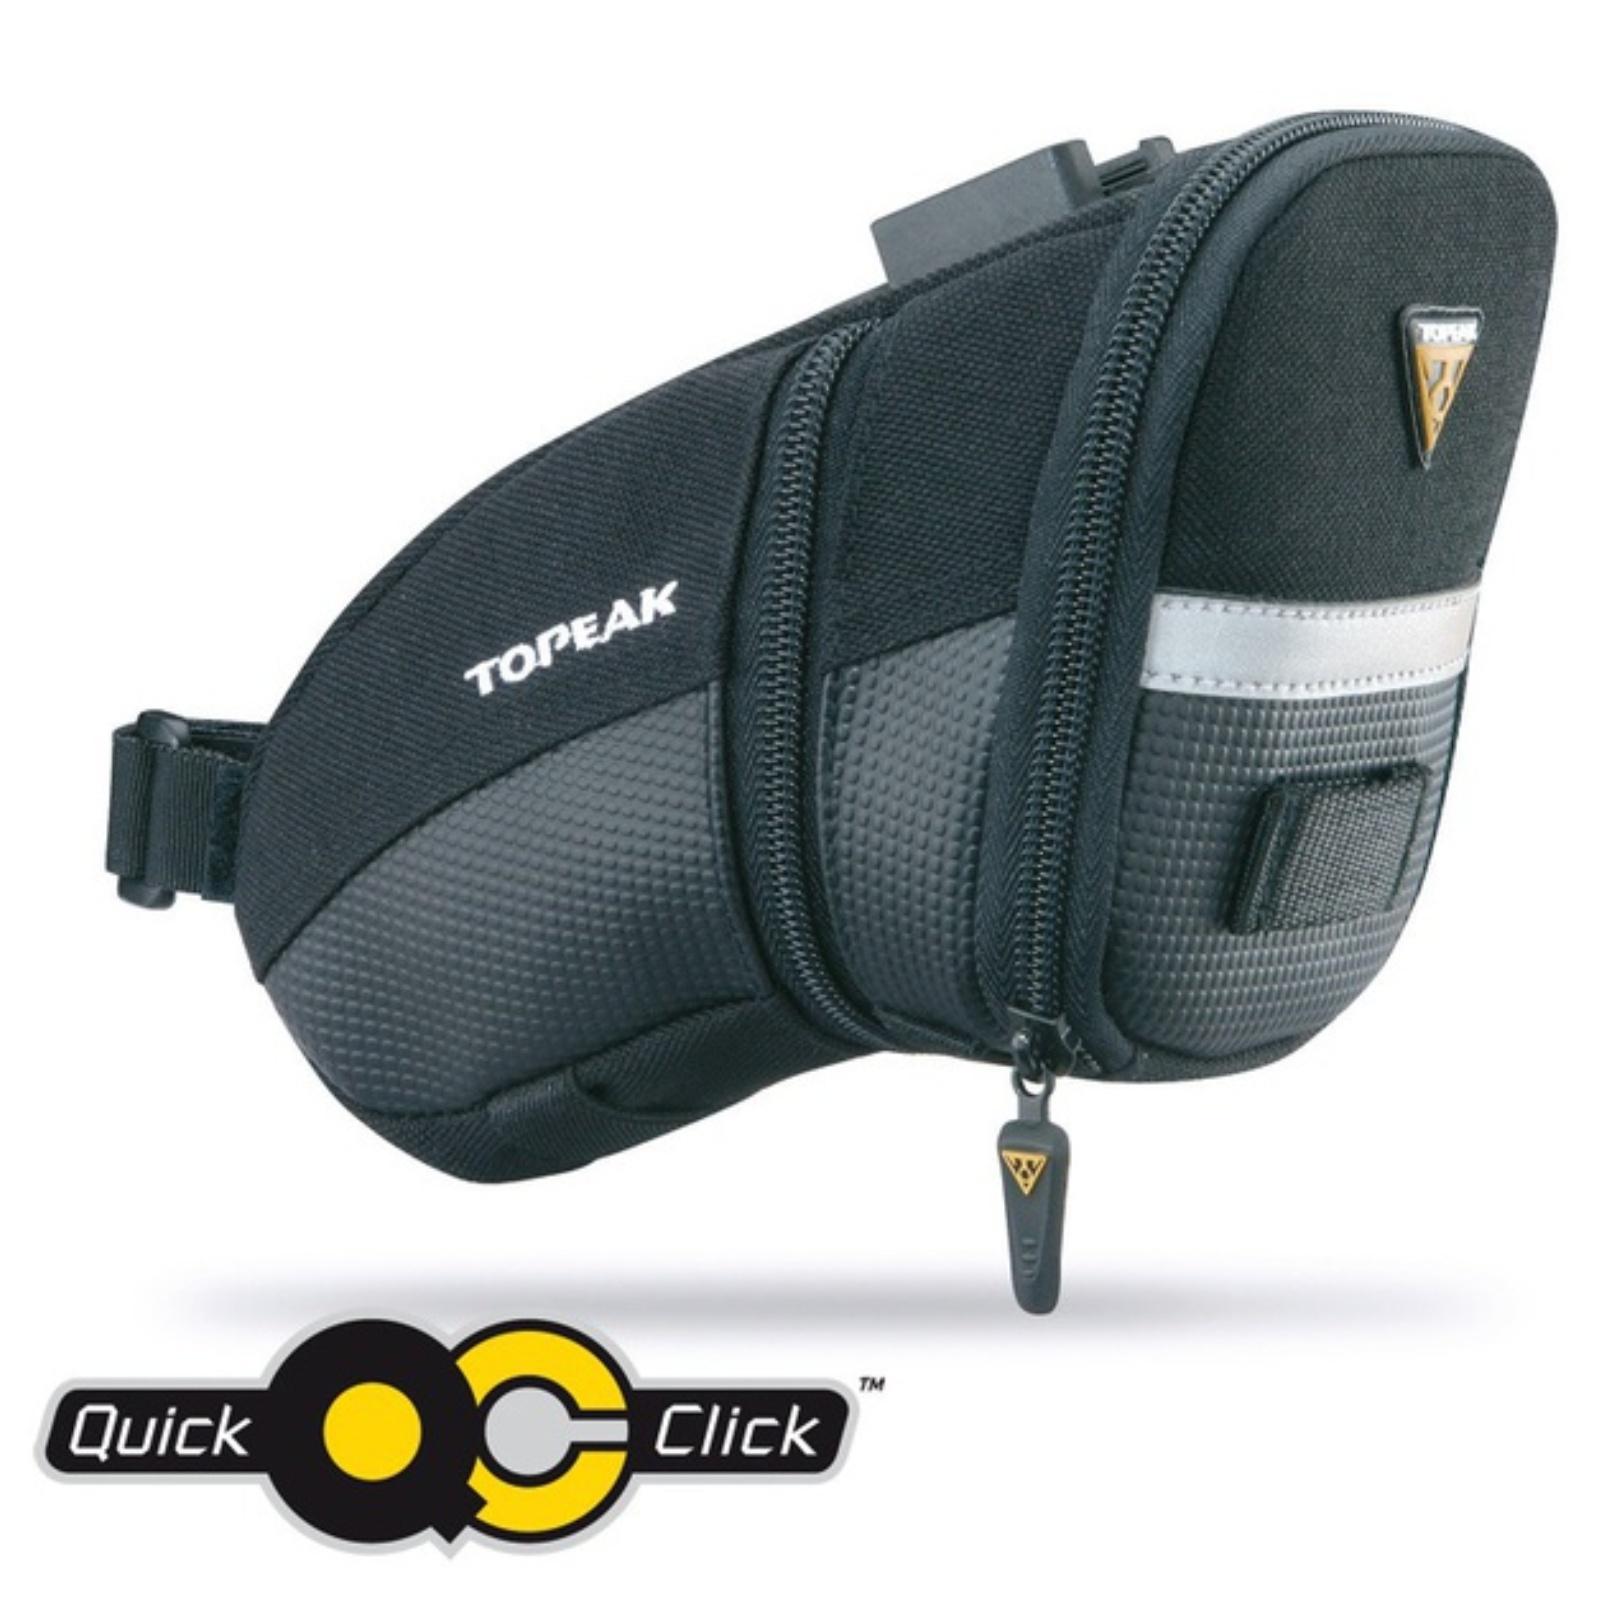 Cyklo brašna TOPEAK AERO WEDGE PACK Medium s Quick Click podsedlová